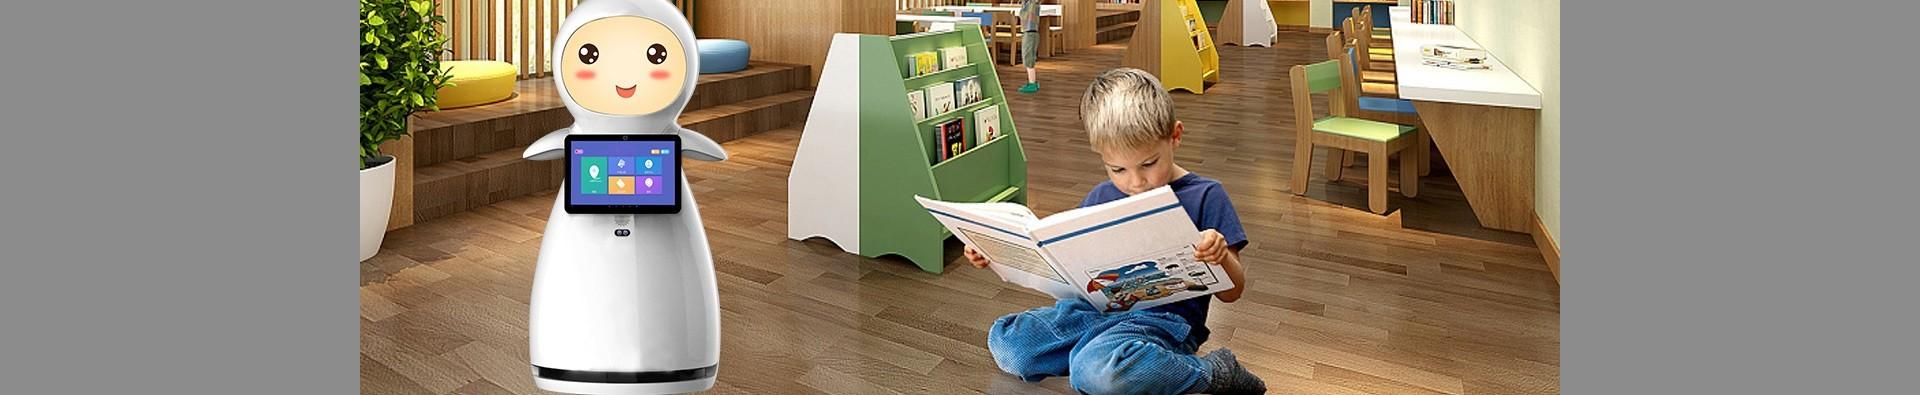 AI Smart Telepresence Educational Robot SIFROBOT-5.1 children